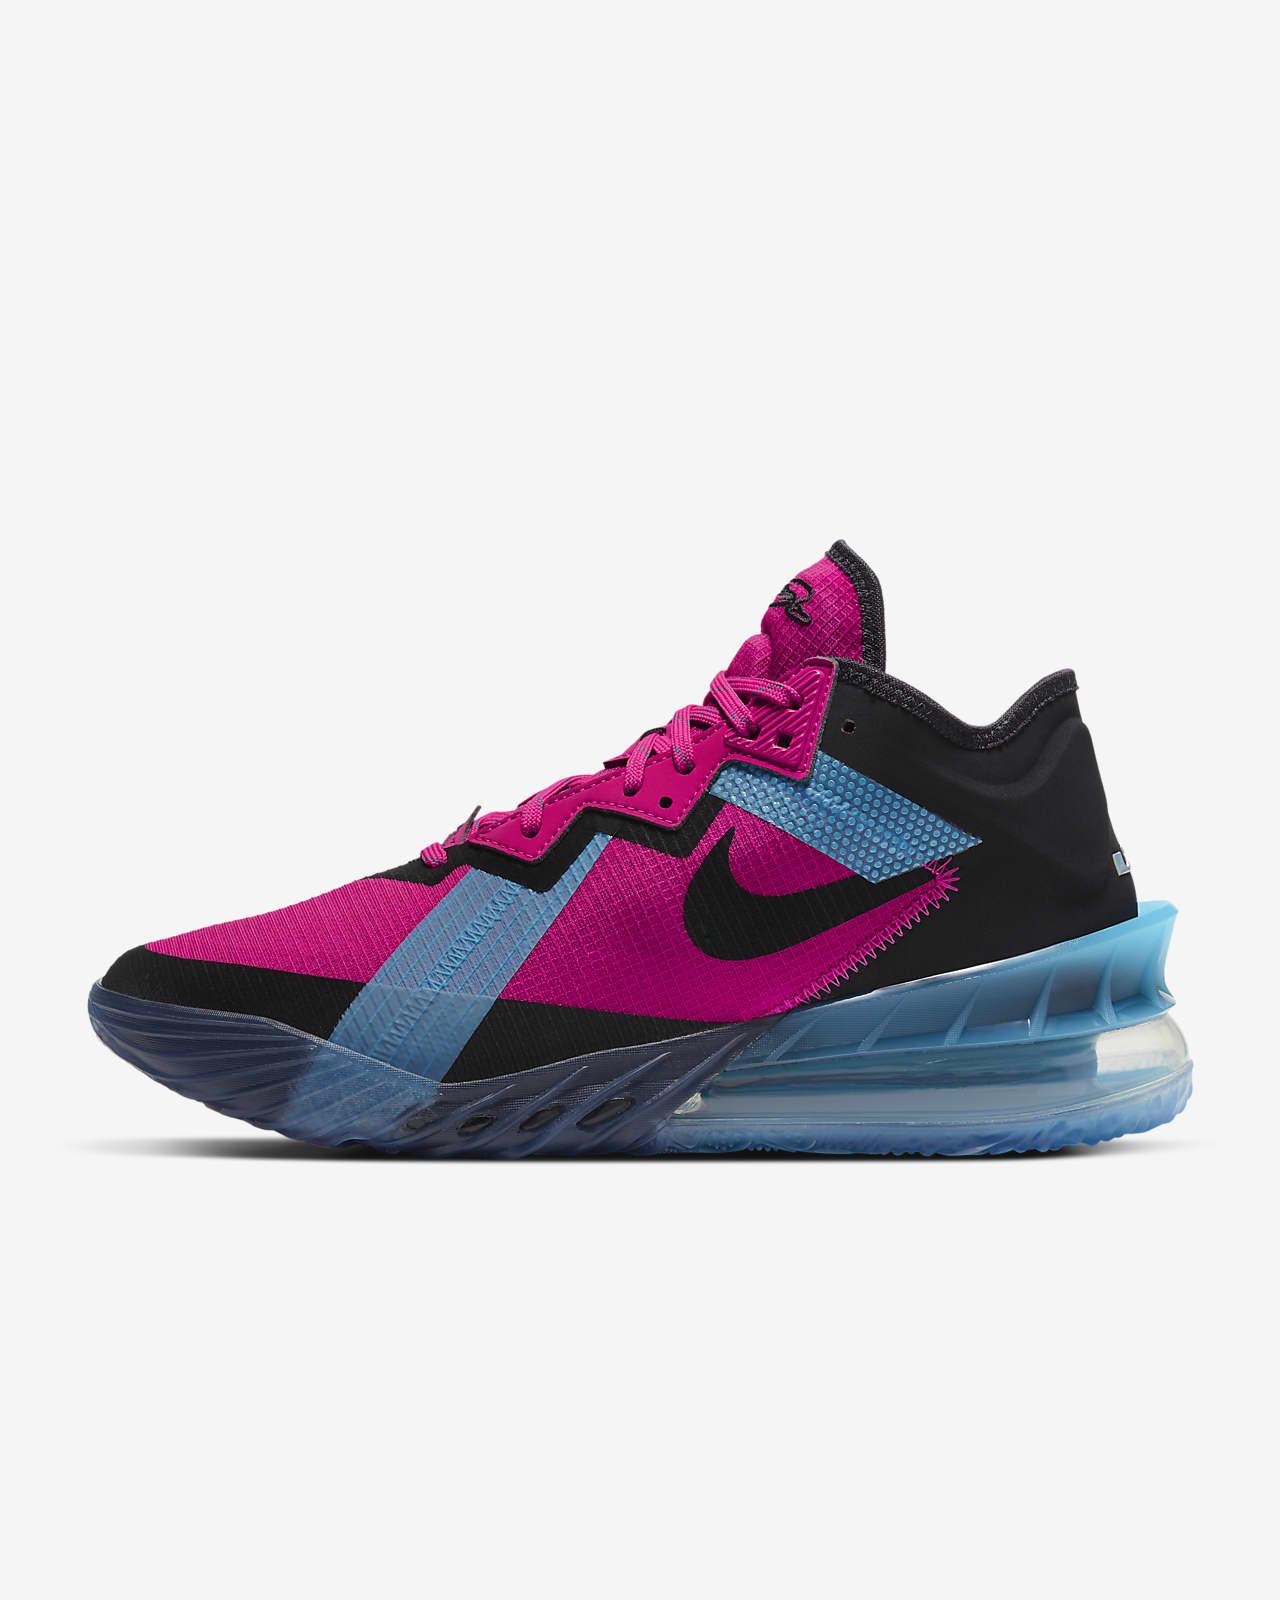 Chaussure de basketball LeBron18 Low «Neon Nights»